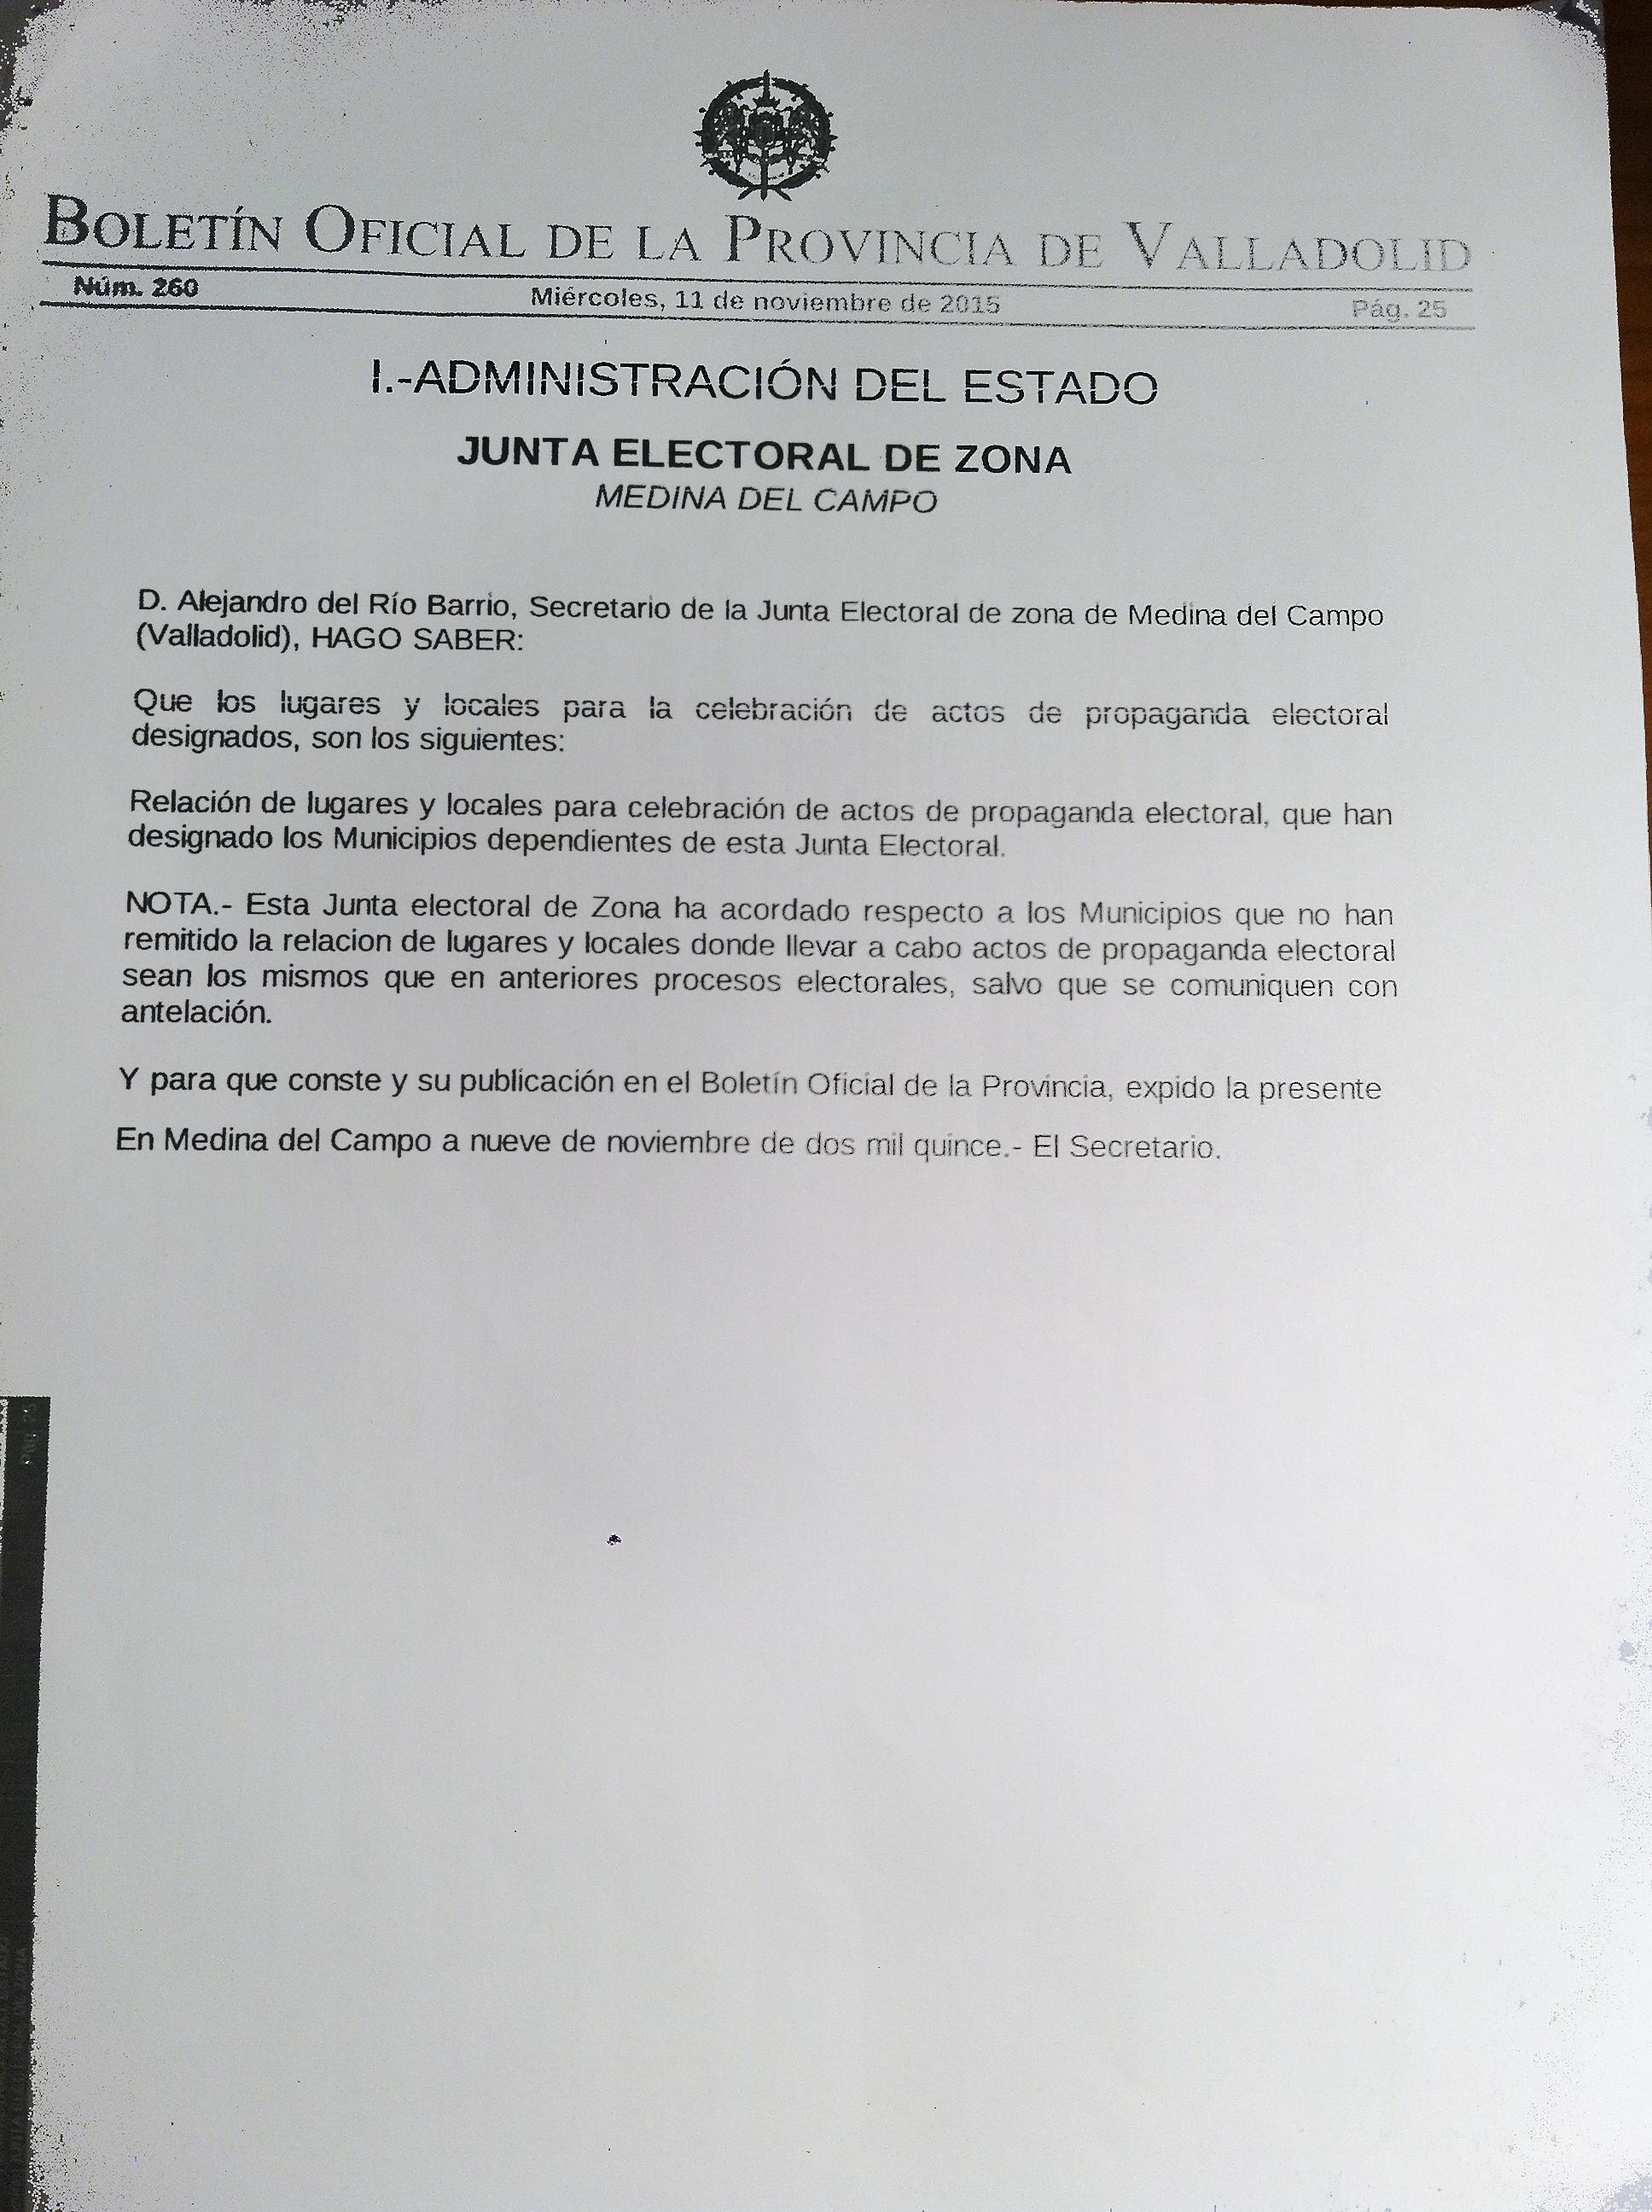 JuntaElectoraldeZona_01